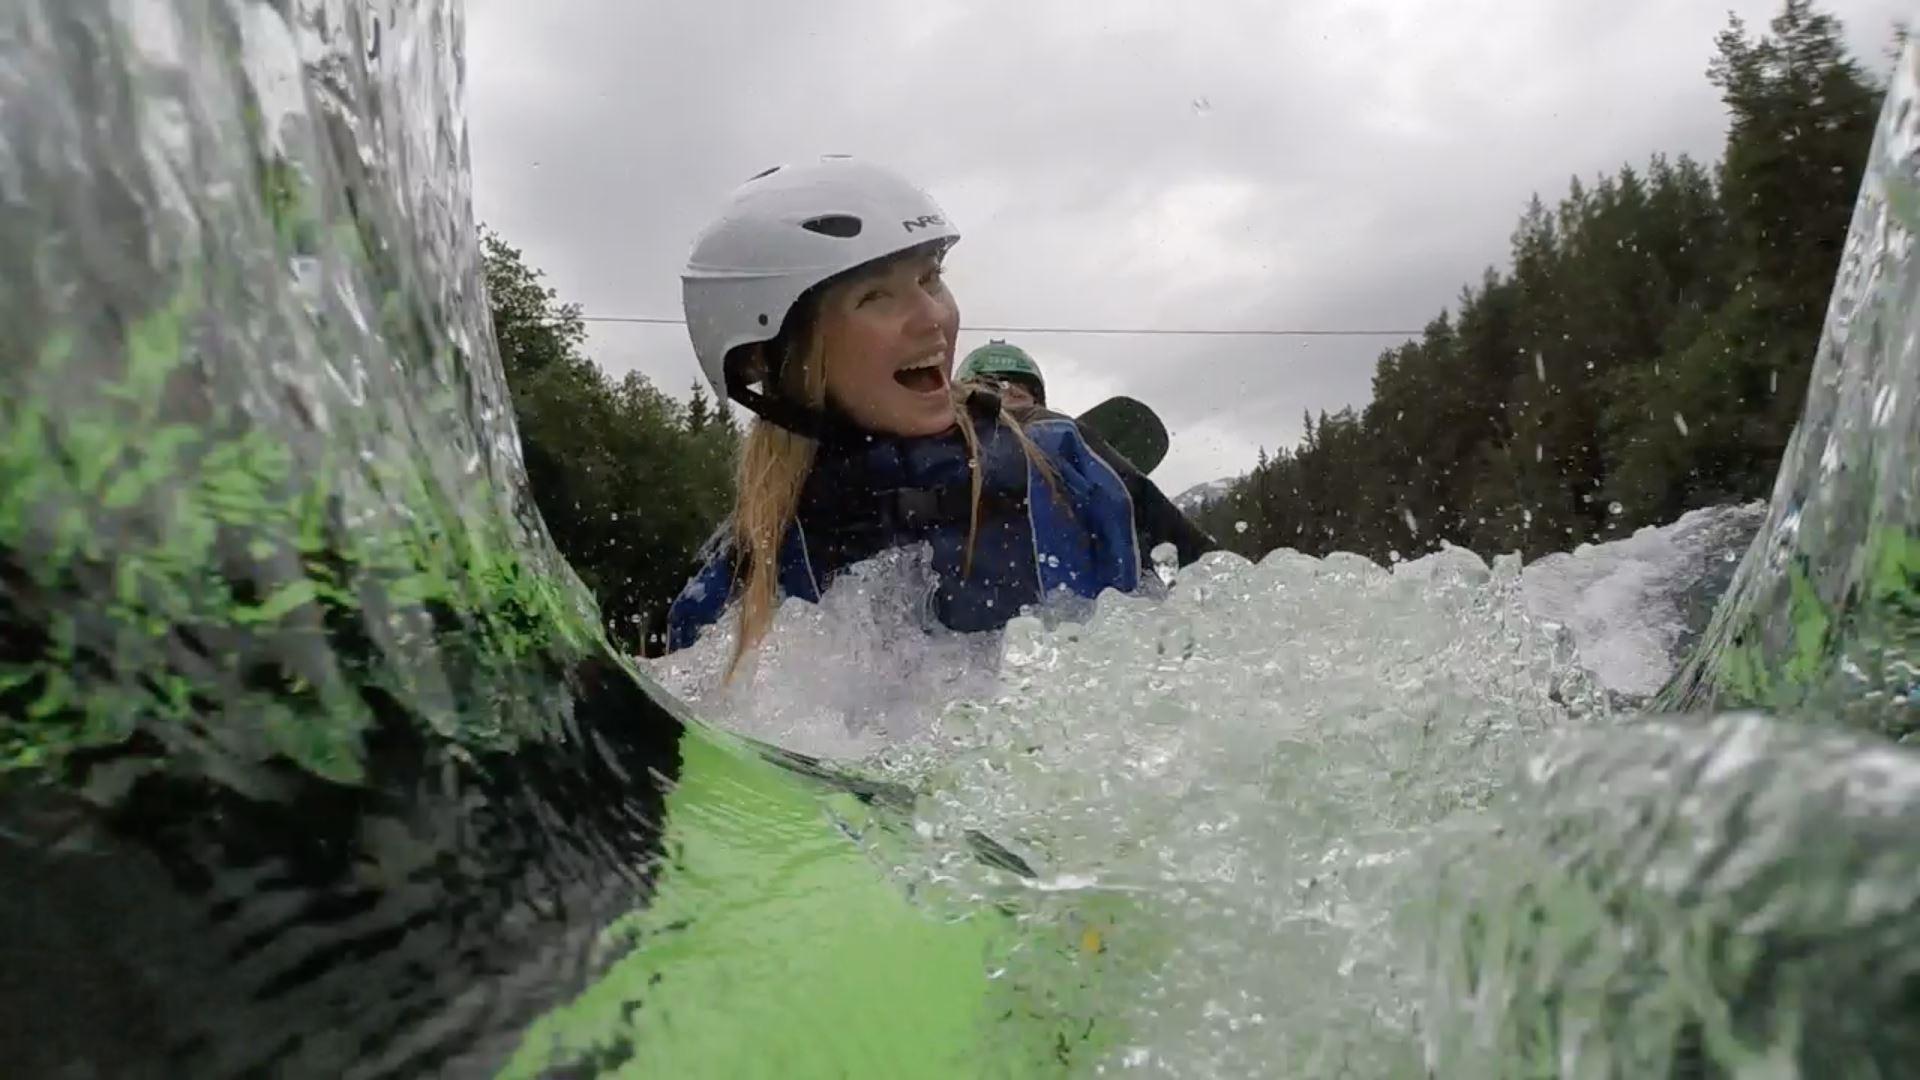 © Outdoor Norway, River Tandem Kayaking